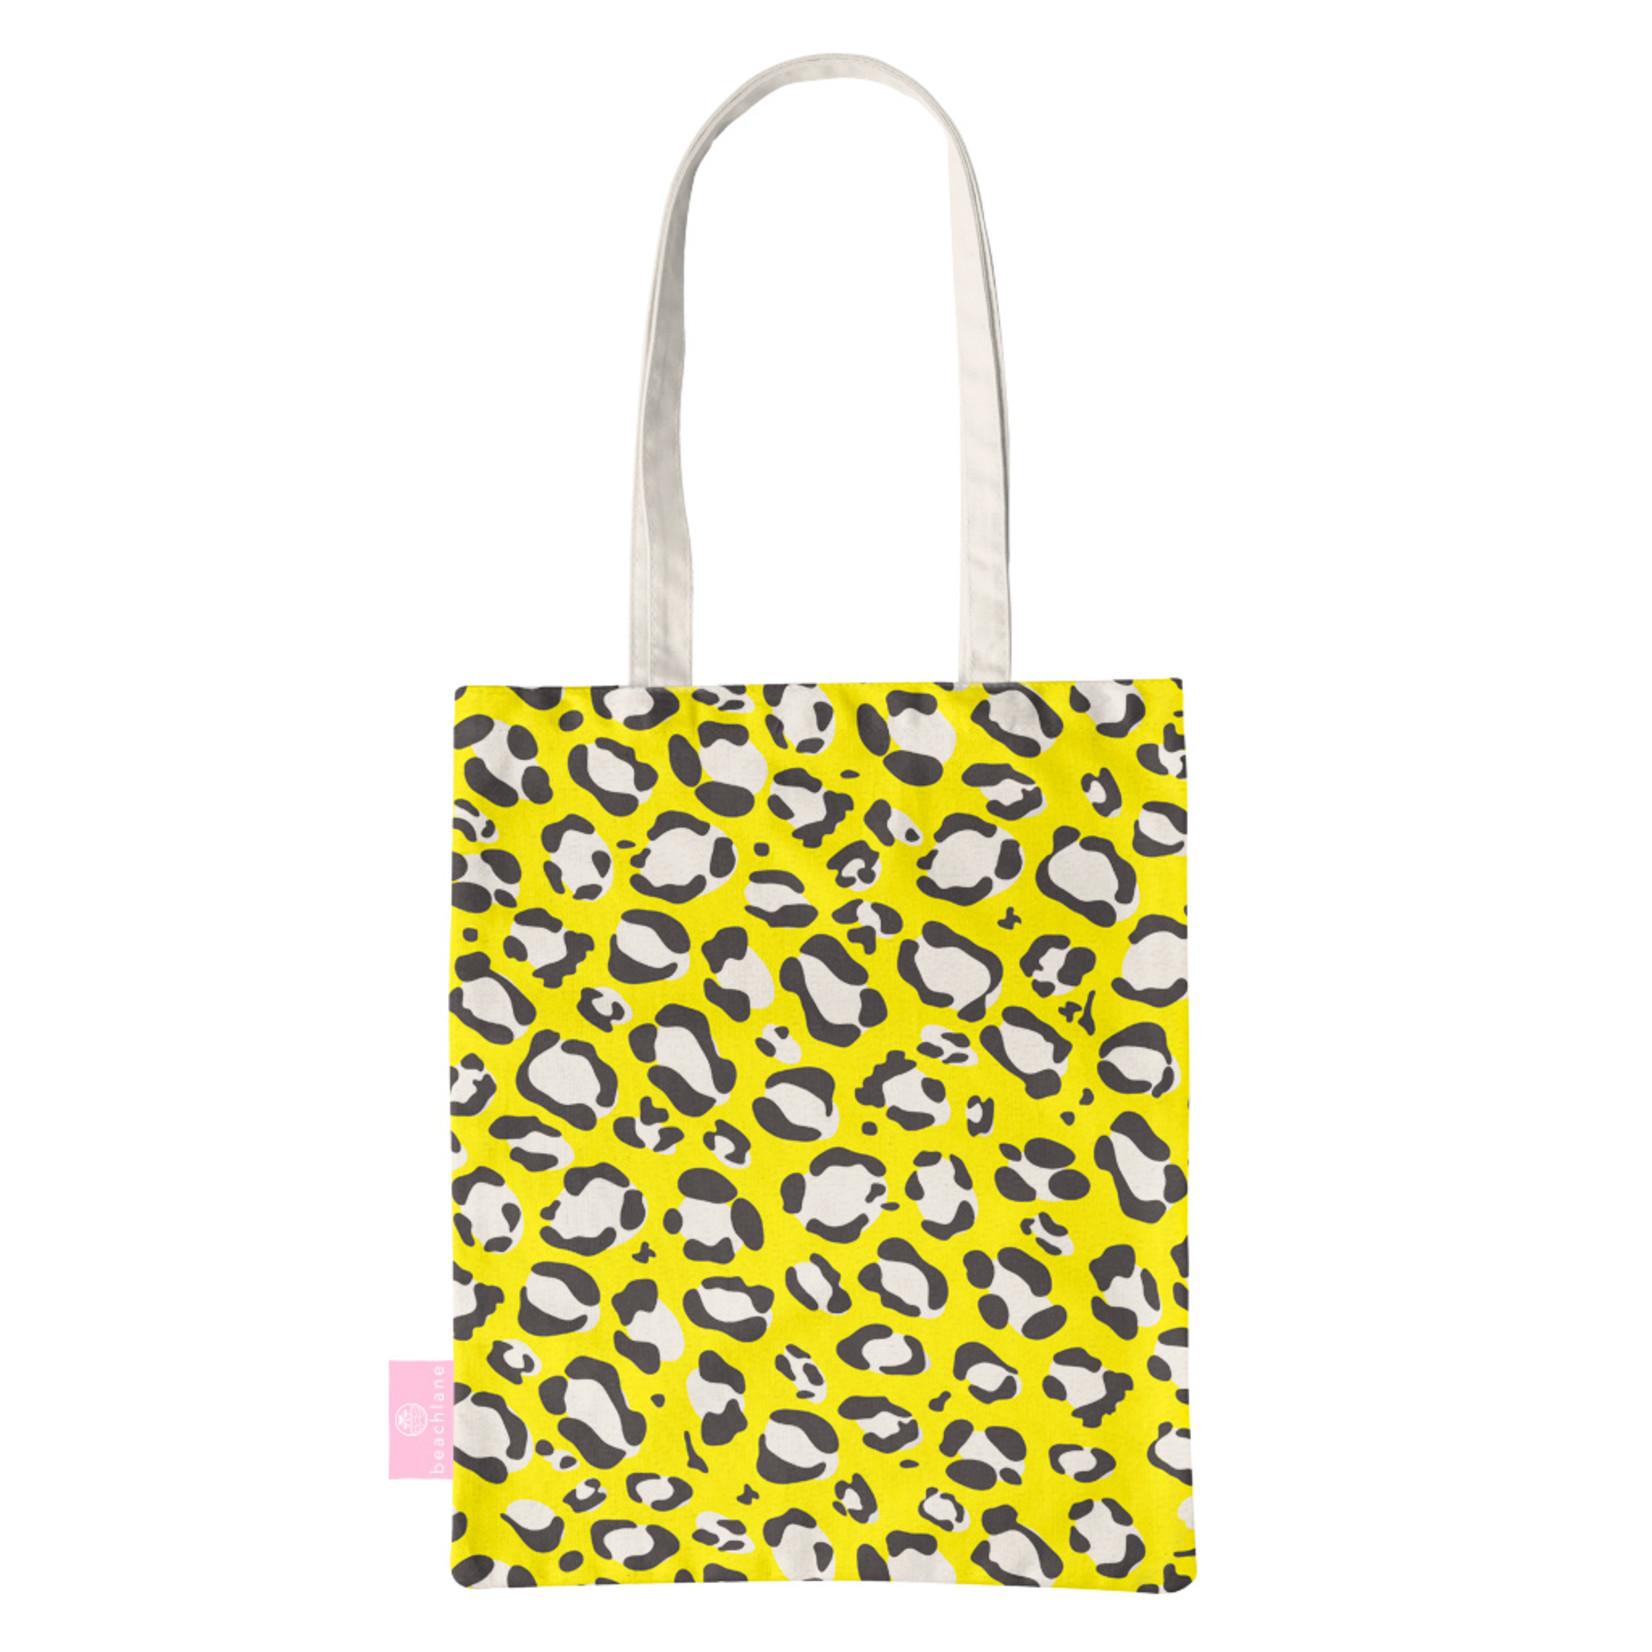 FOONCASE BEACHLANE - Canvas Tote Bag - Wild Collection - Yellow